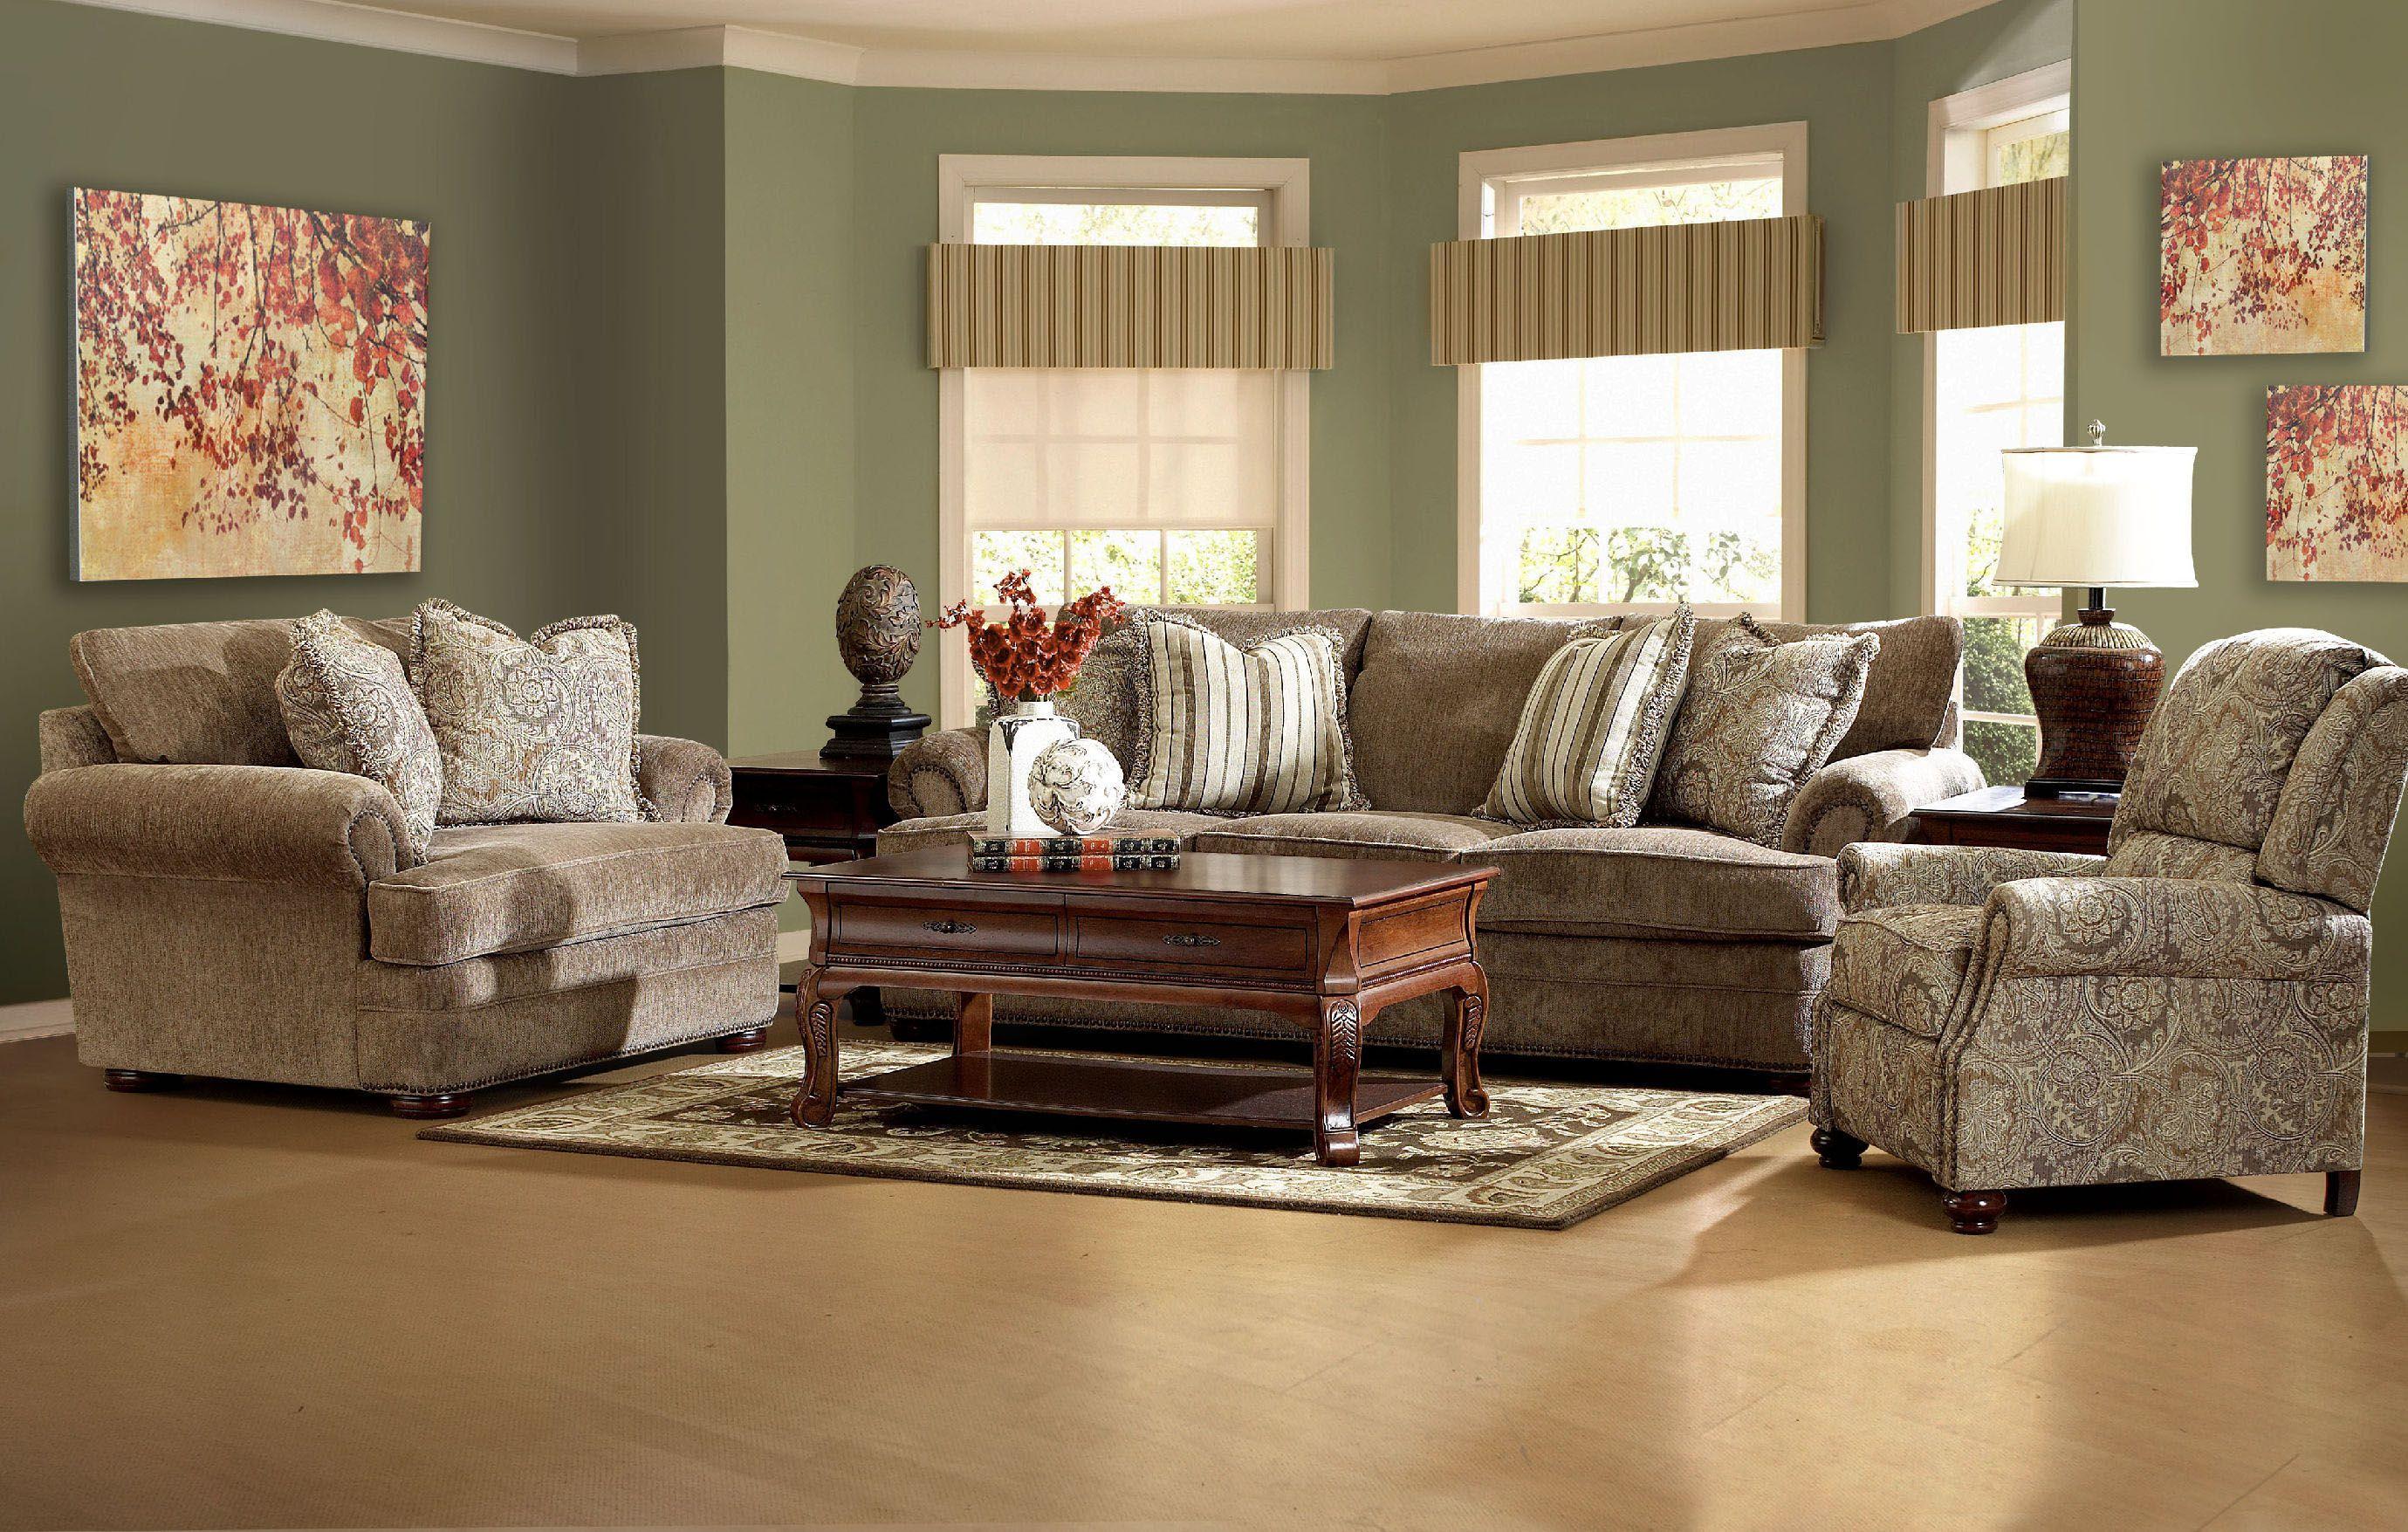 Klaussner Living Room Tolbert Sofa K10 S - Klaussner Home